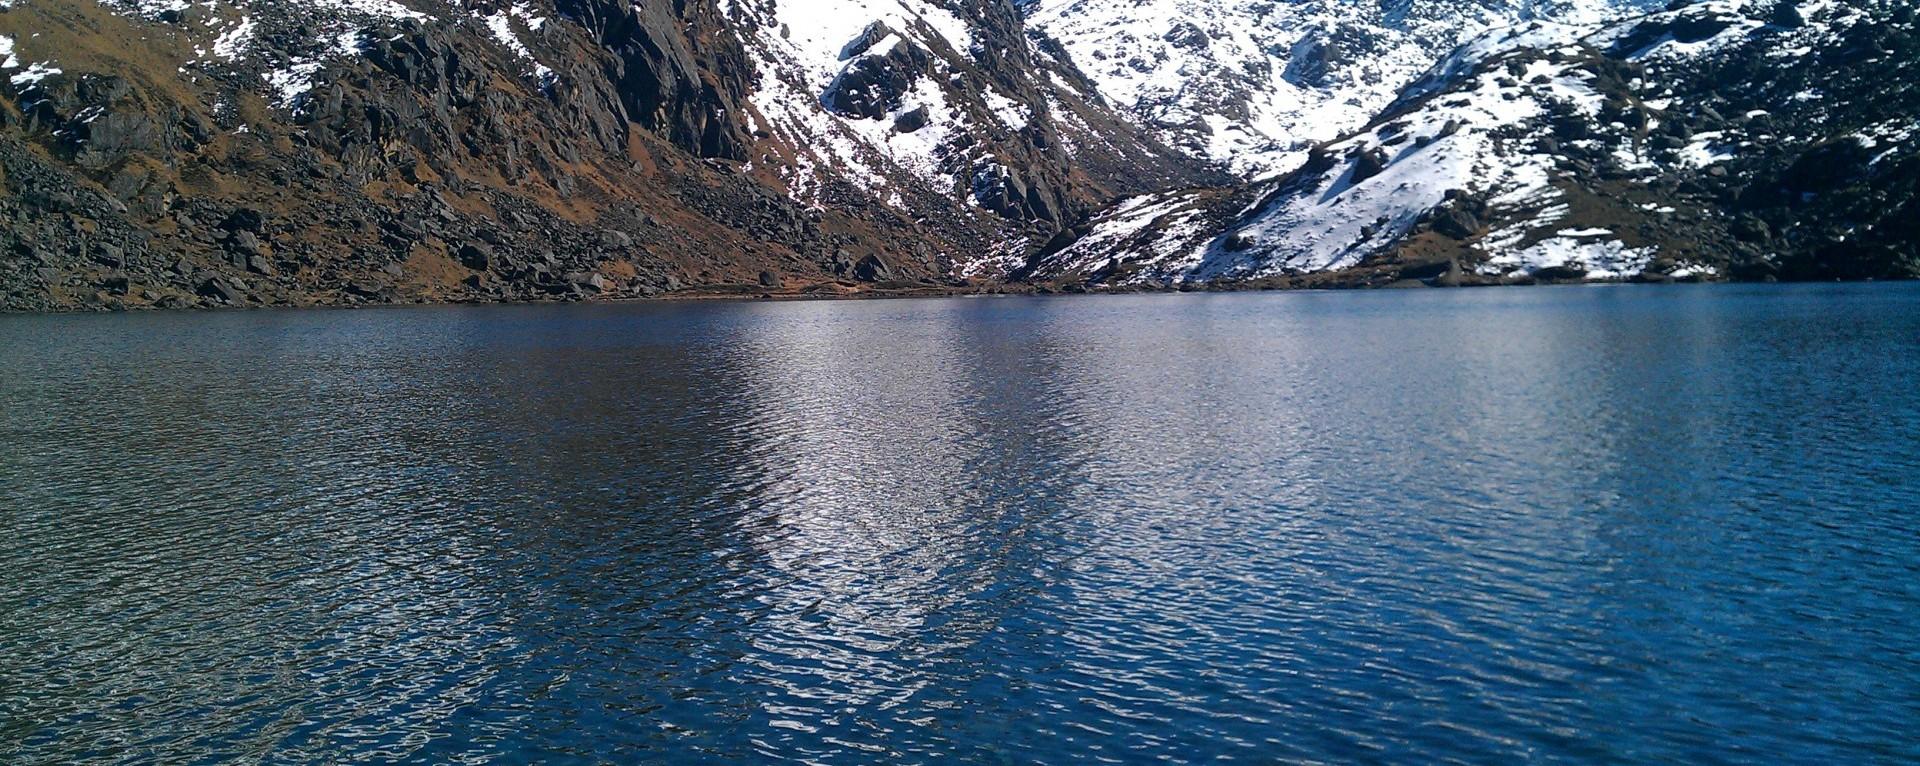 Langtang - Gosainkunda - Helambu Trekking-1